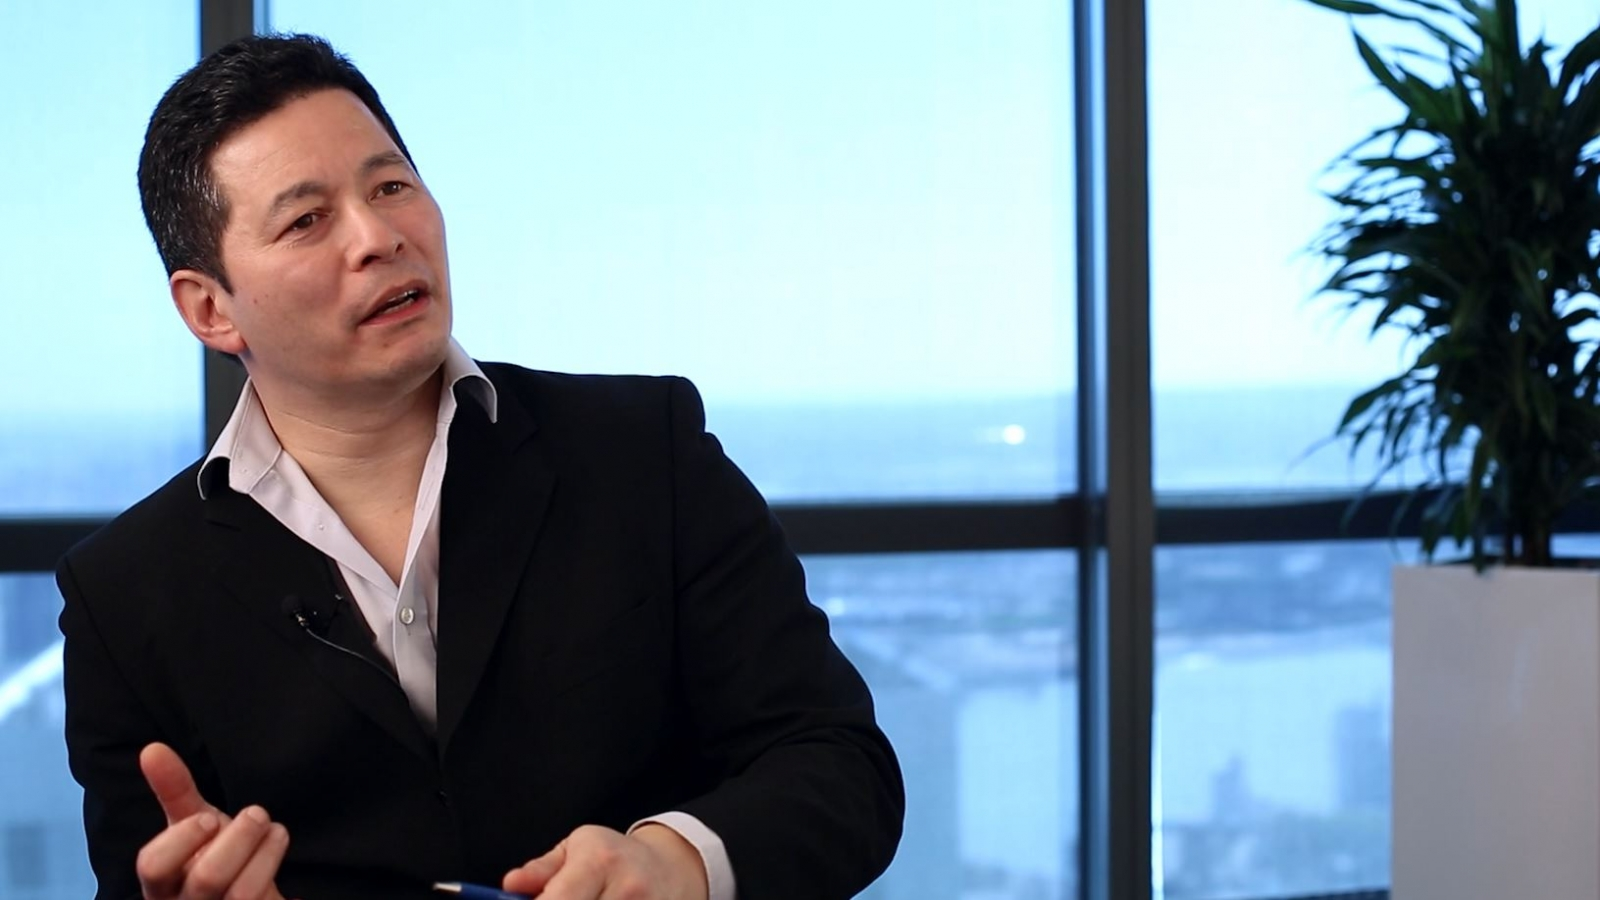 Edmund Shing Money Talks Shell BG deal